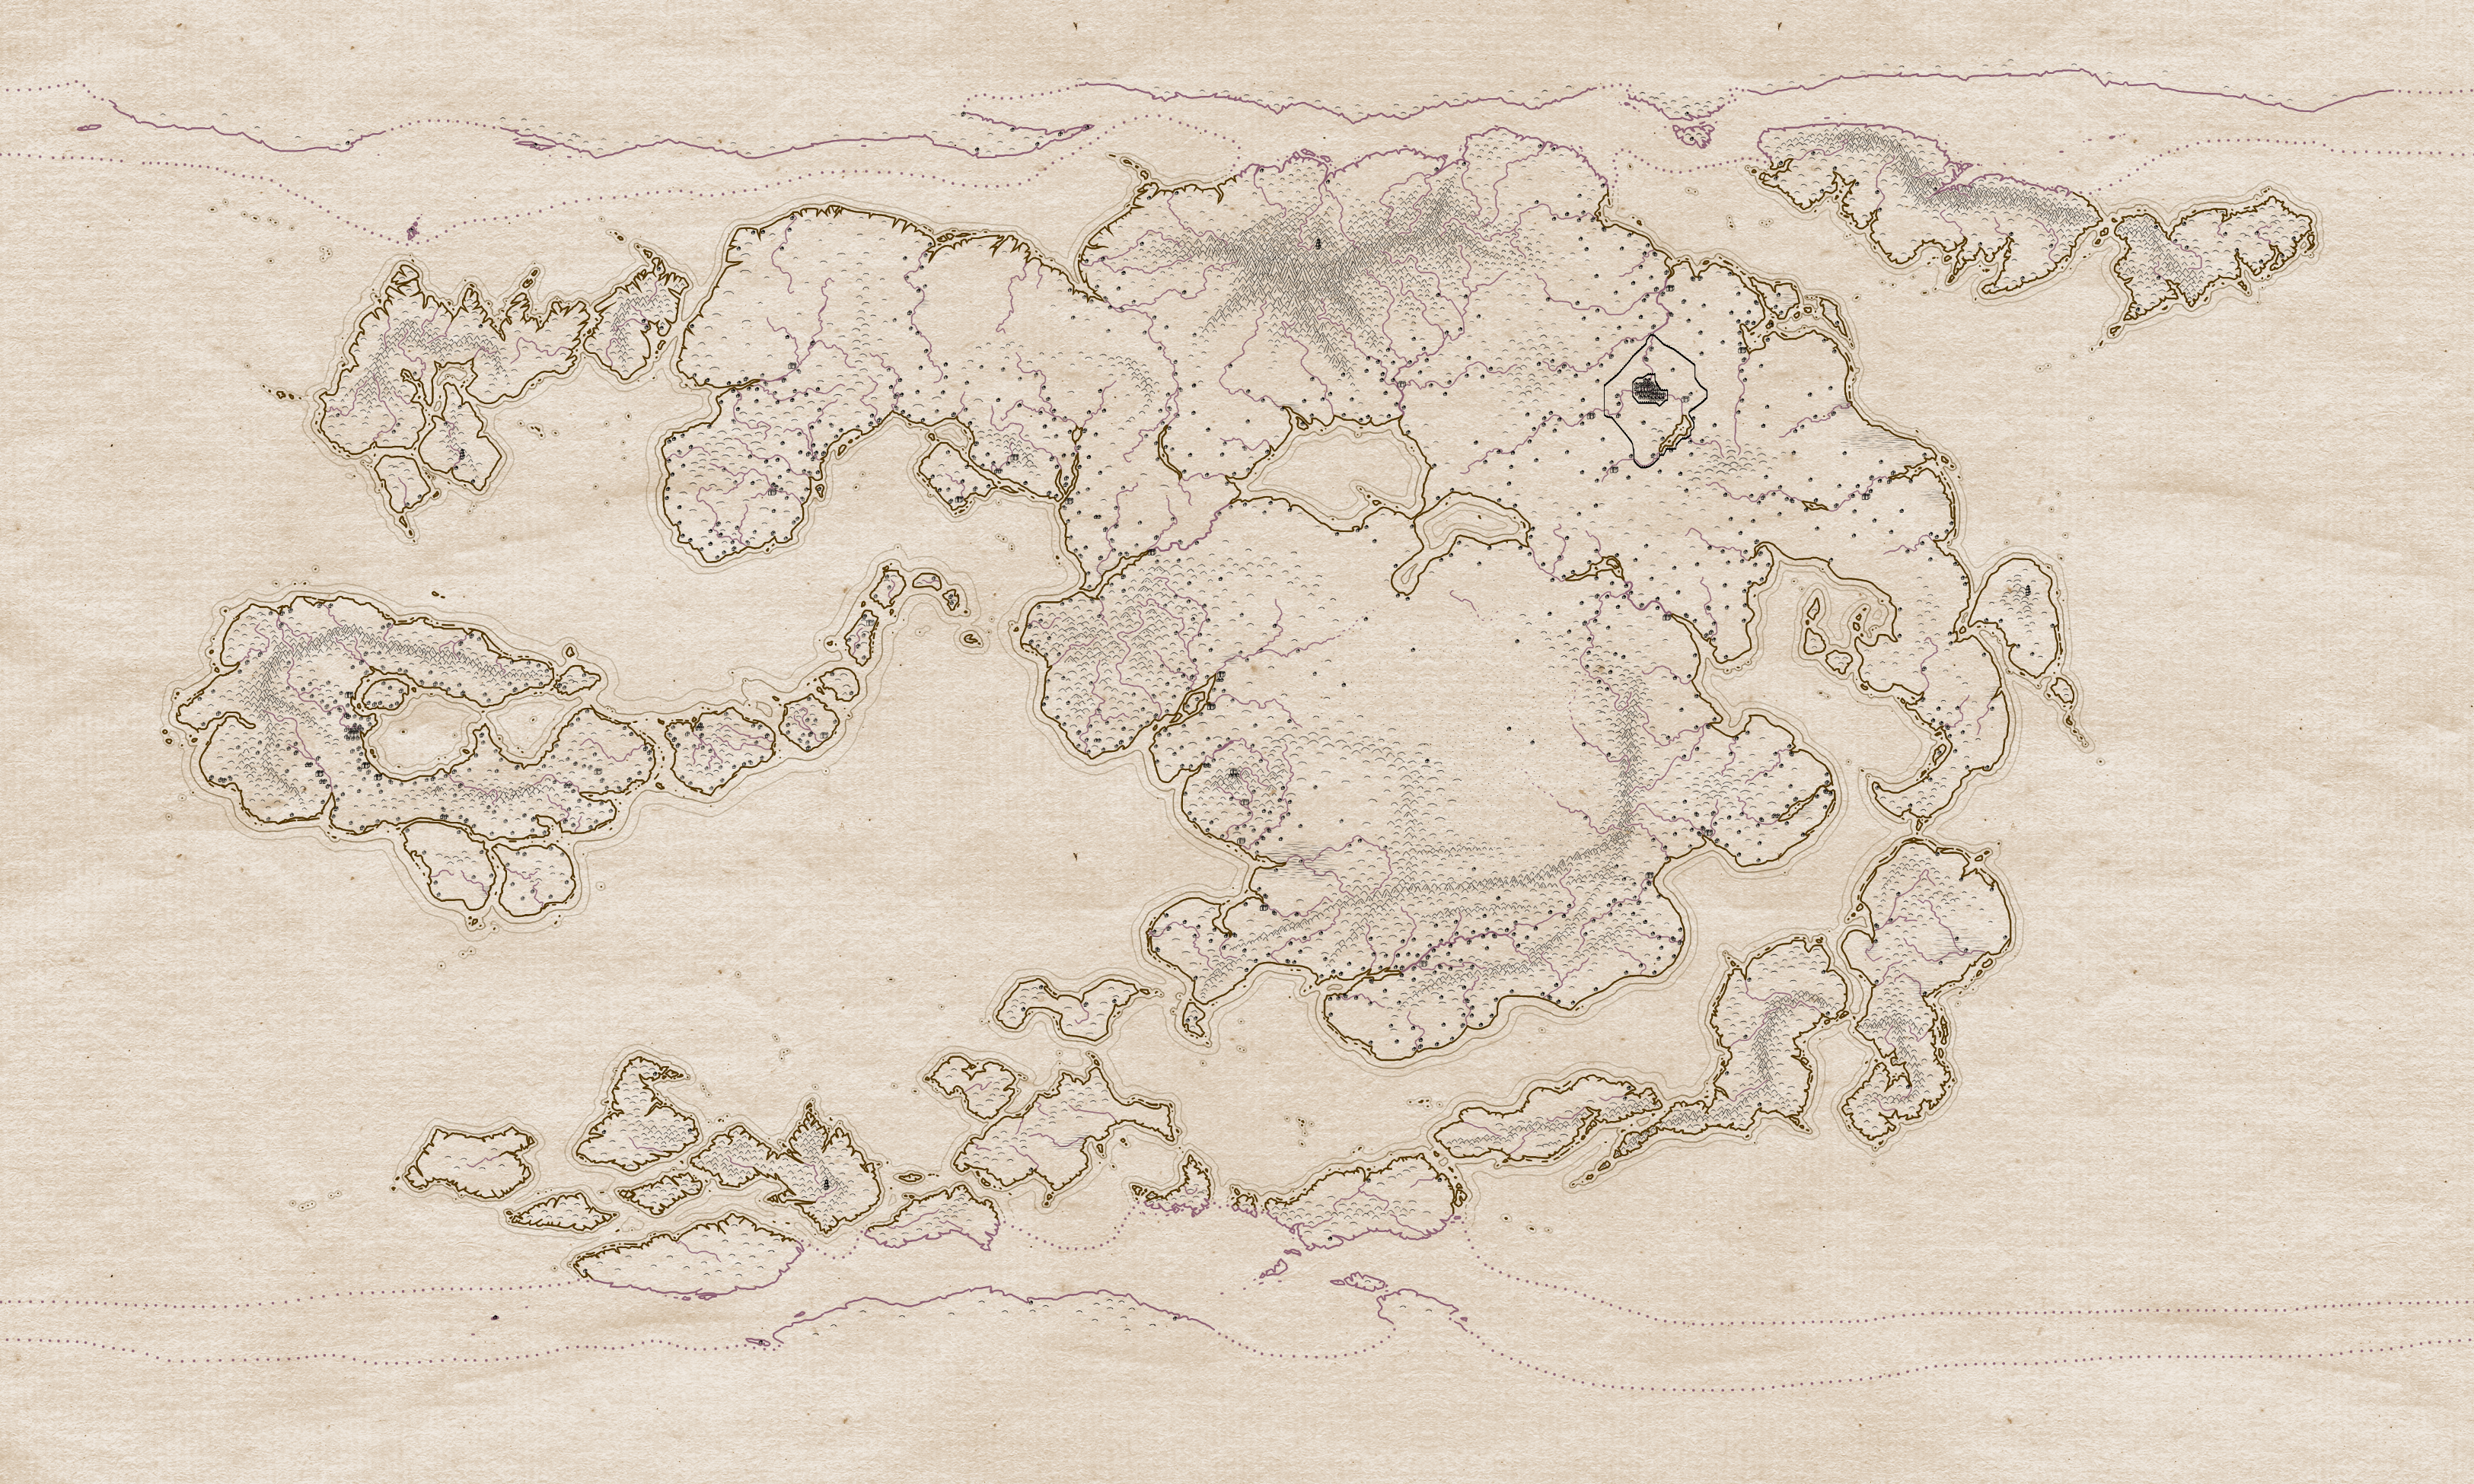 Avatar Physical World Map by djinn327 on DeviantArt